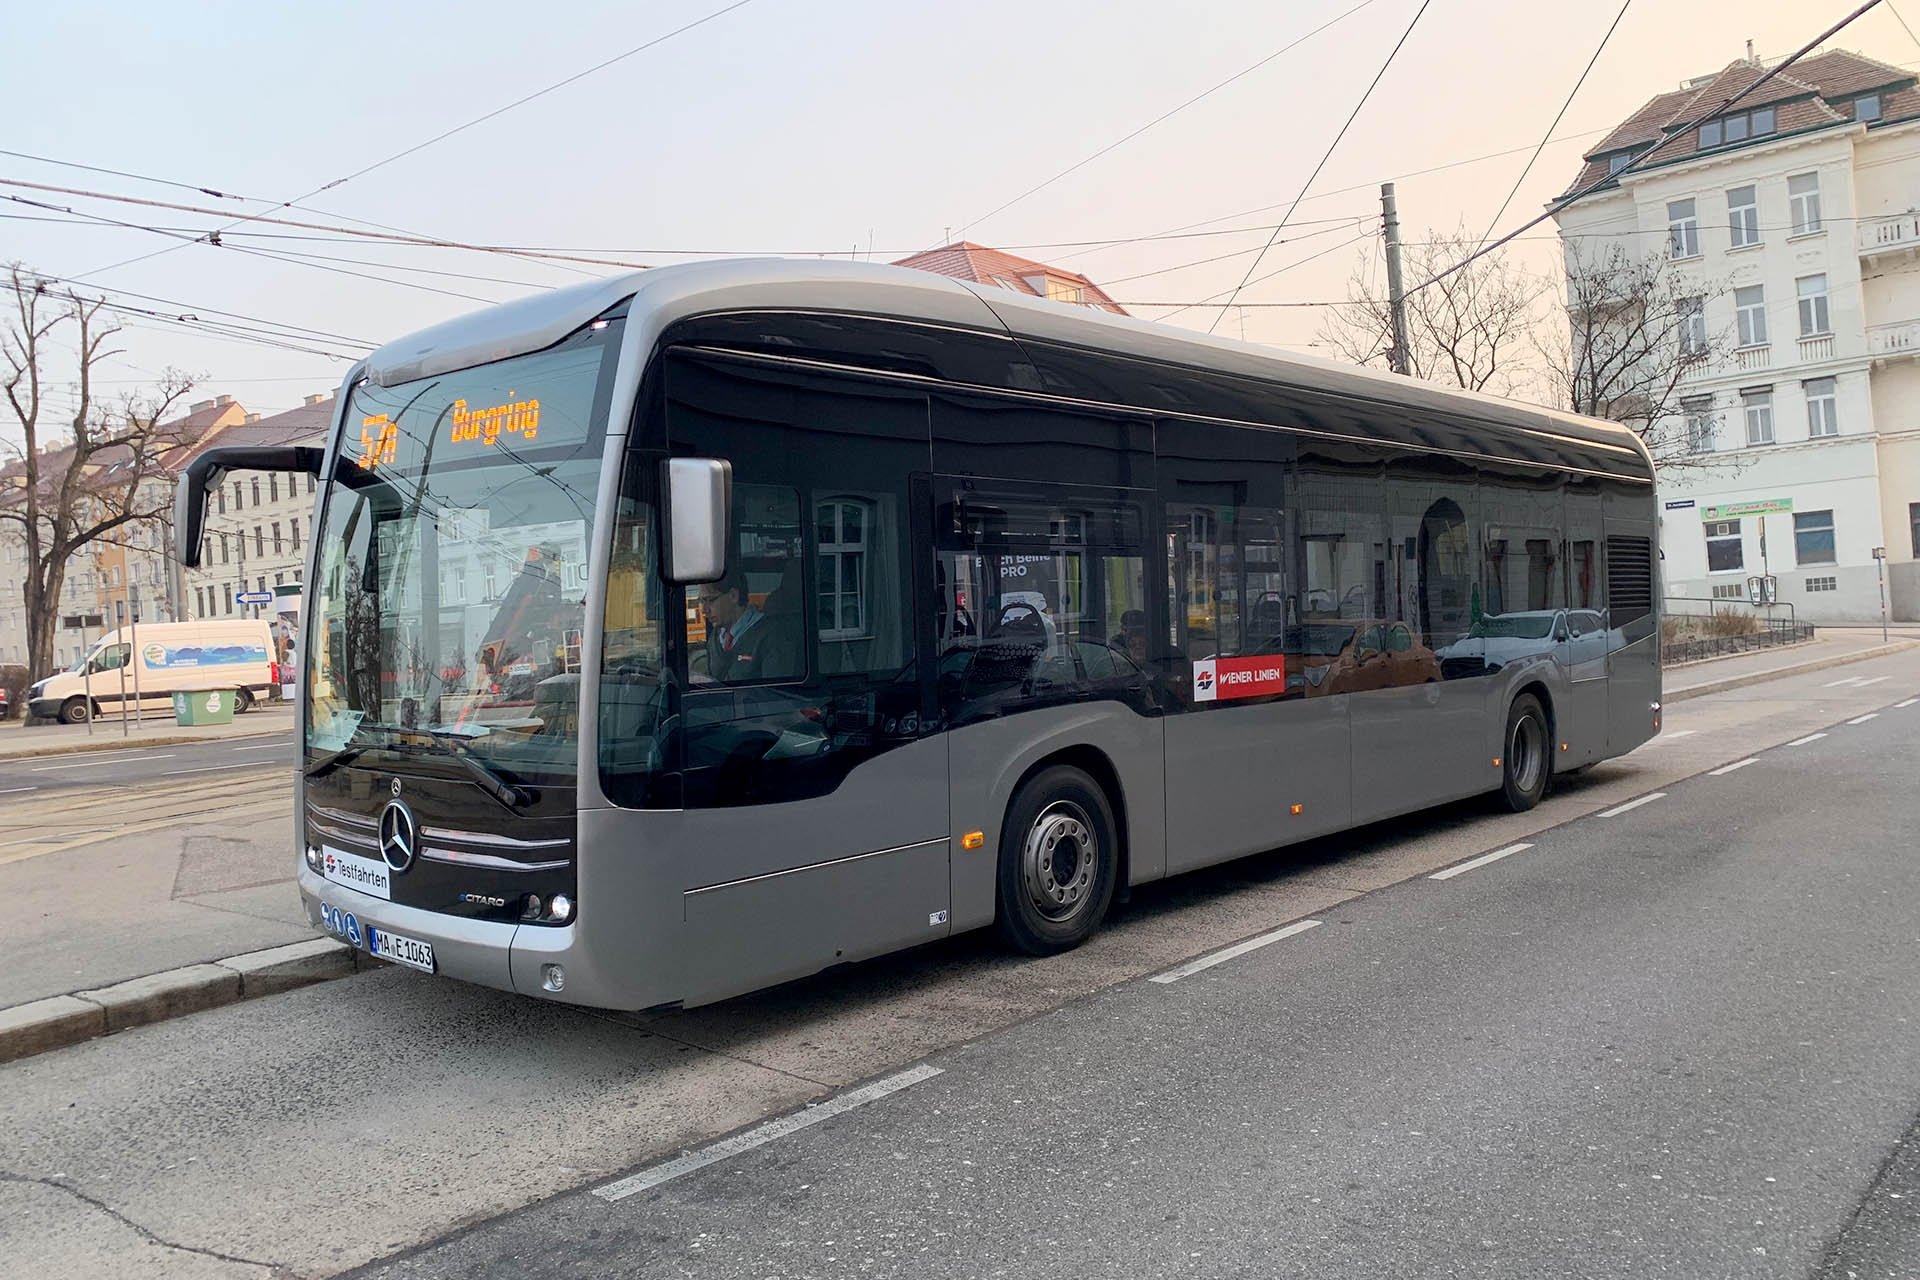 https://public-transport.net/bus/Wien_Bus/Testbusse/eCitaro/slides/IMG_0796.jpg